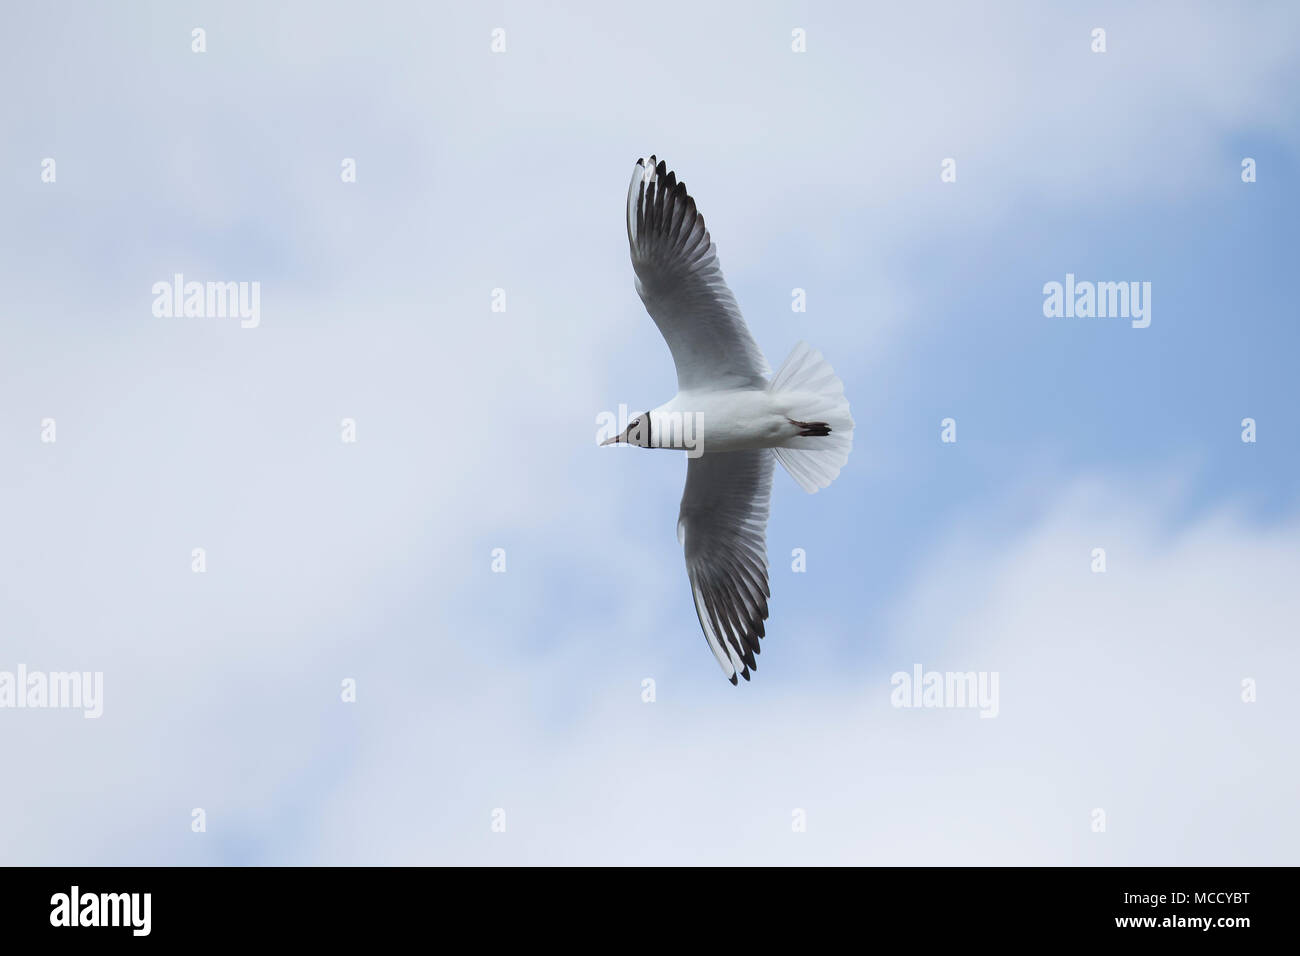 Black Headed gull Larus Ridibundus in flight against a blue and white sky - Stock Image